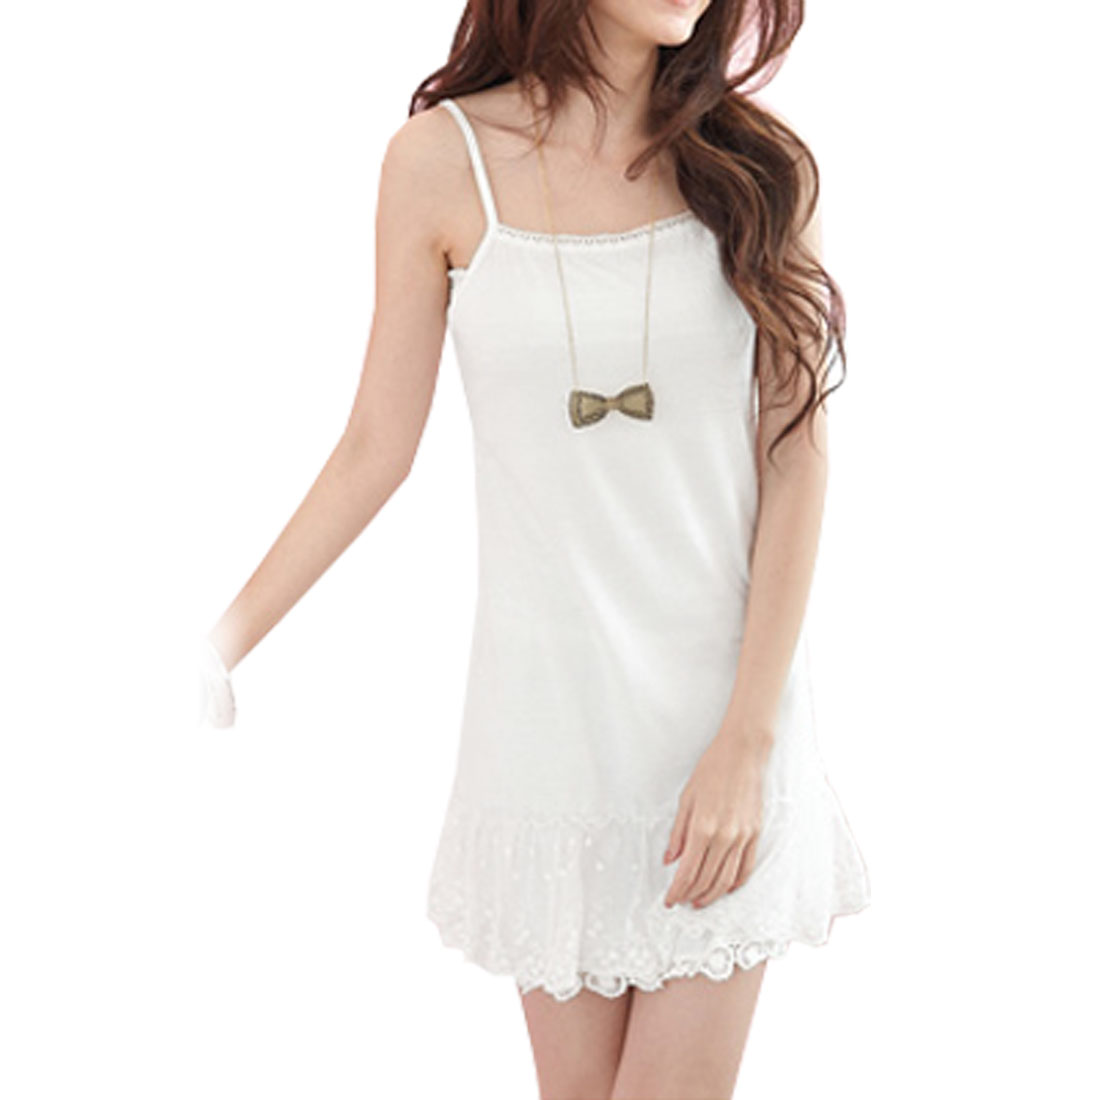 Women Pullover Sleeveless Solid White Basic Spaghetti Dress XS